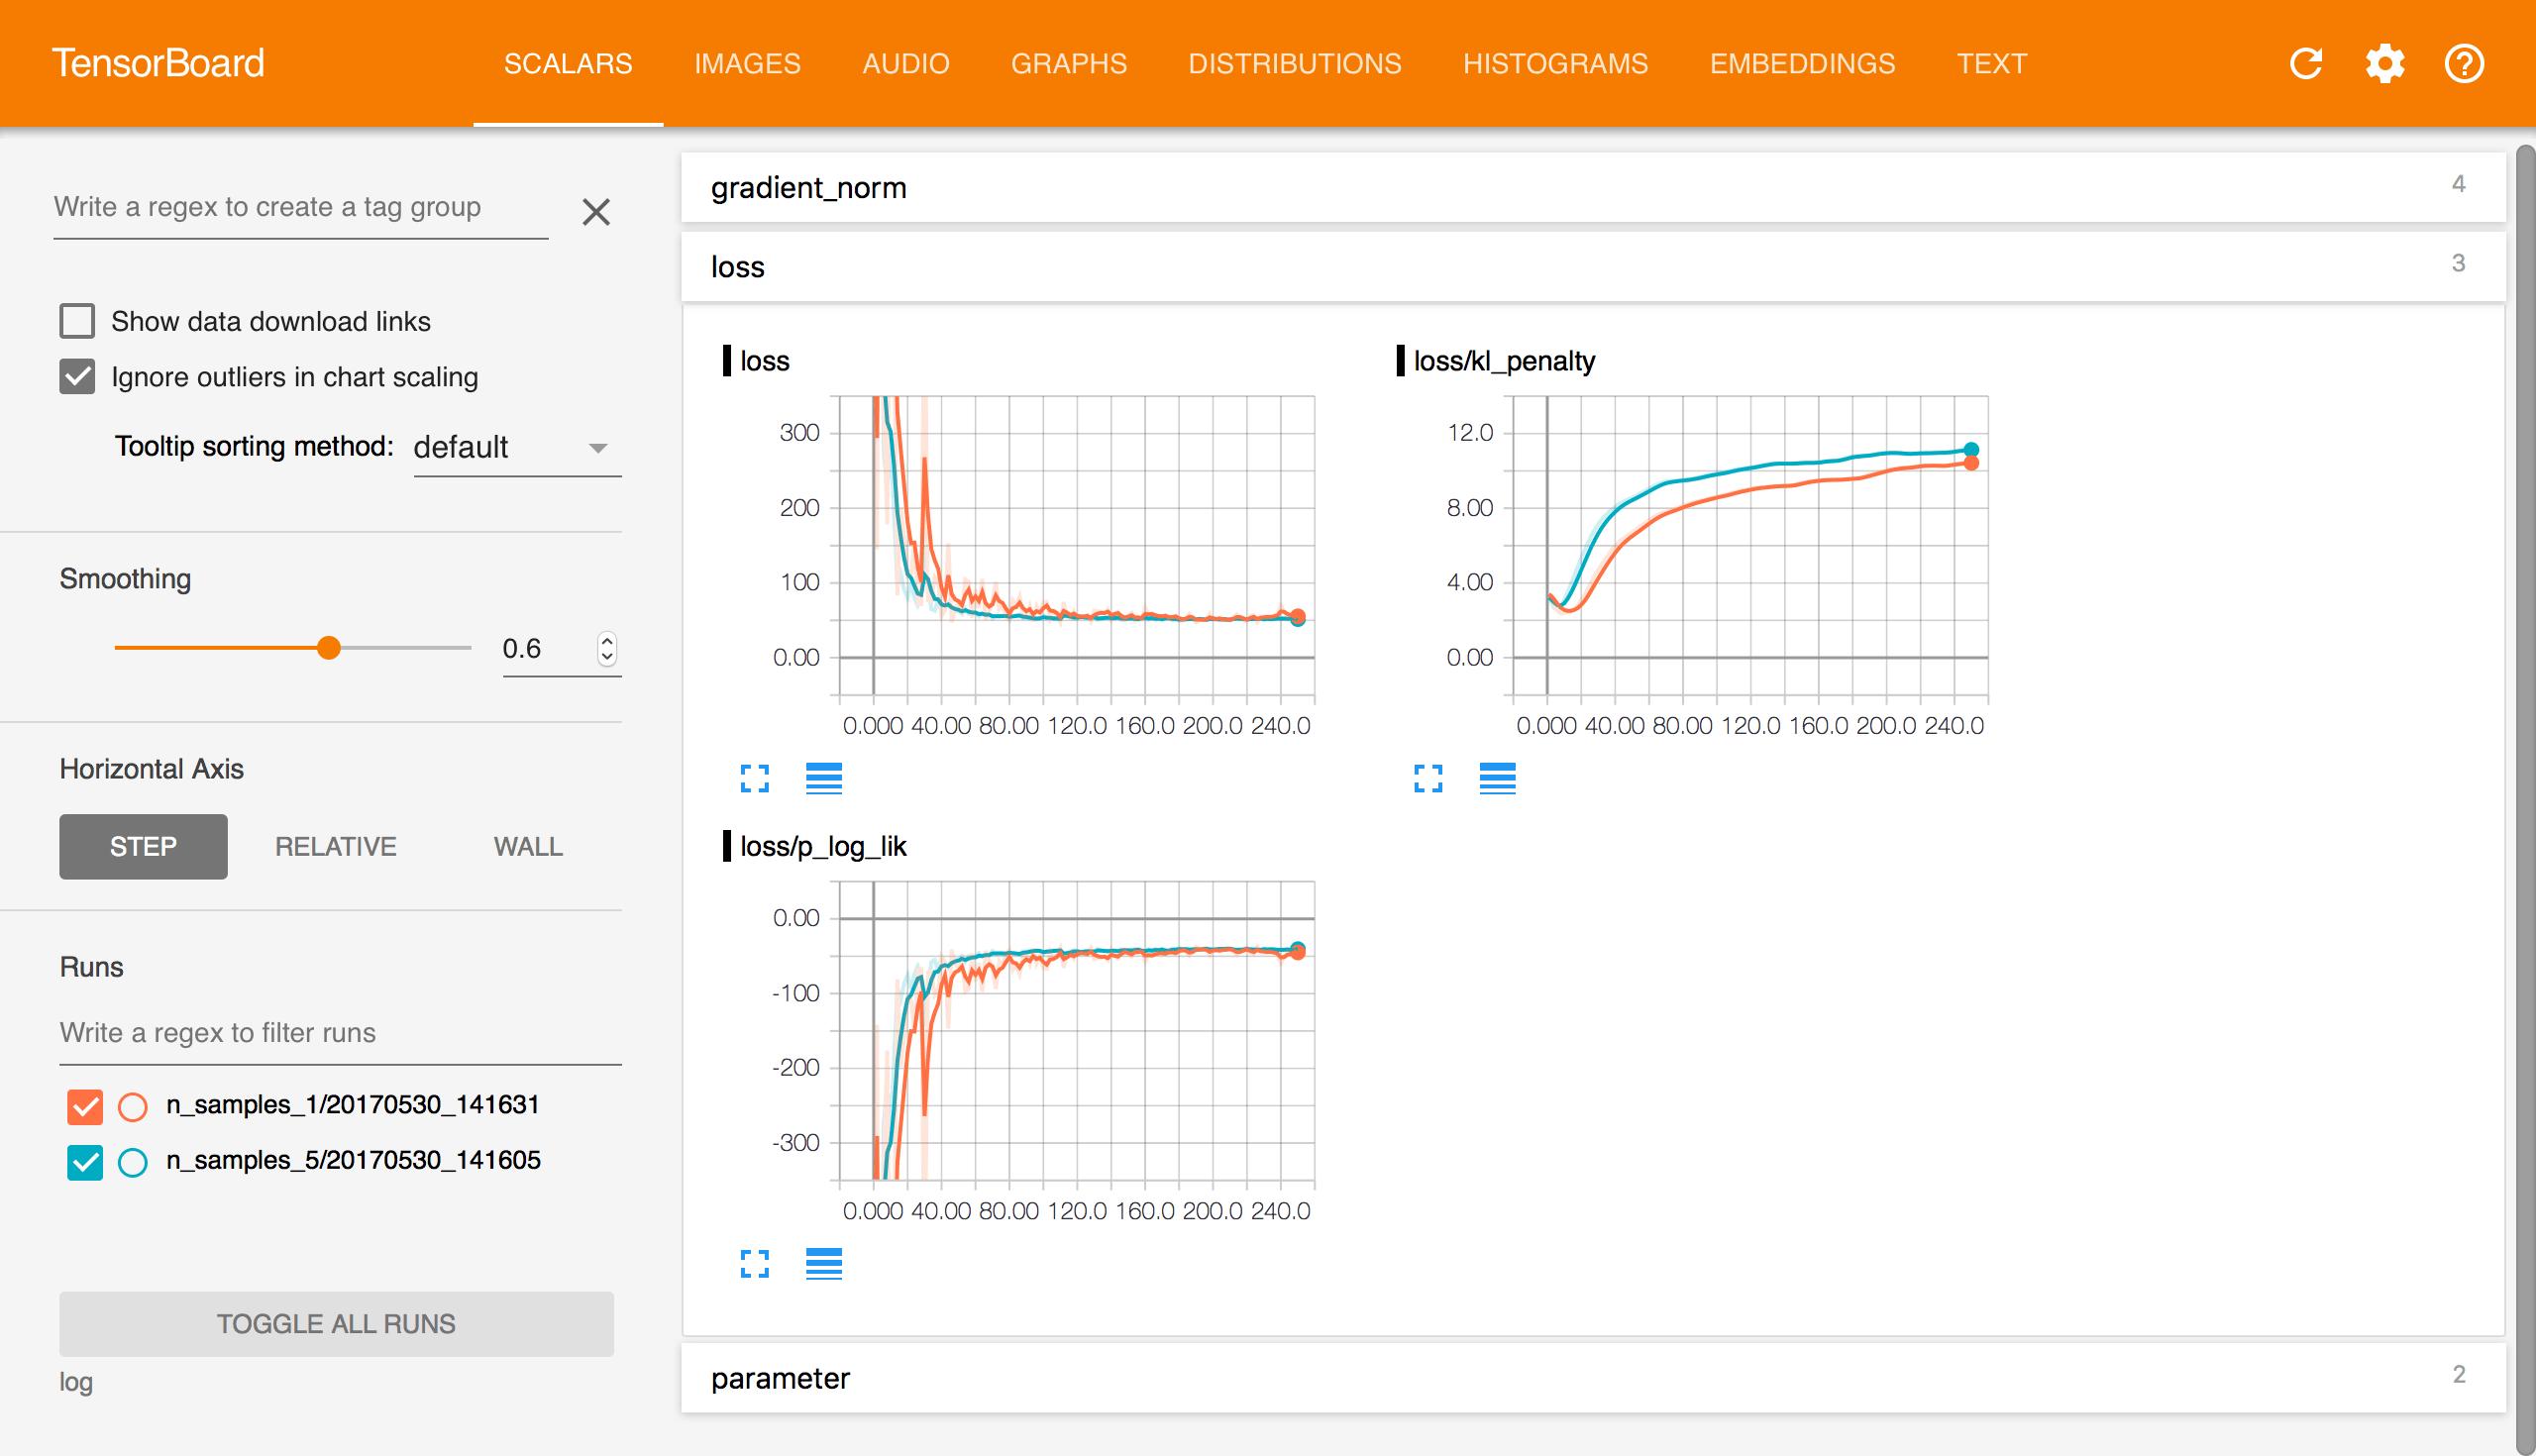 Tensorboard on FloydHub